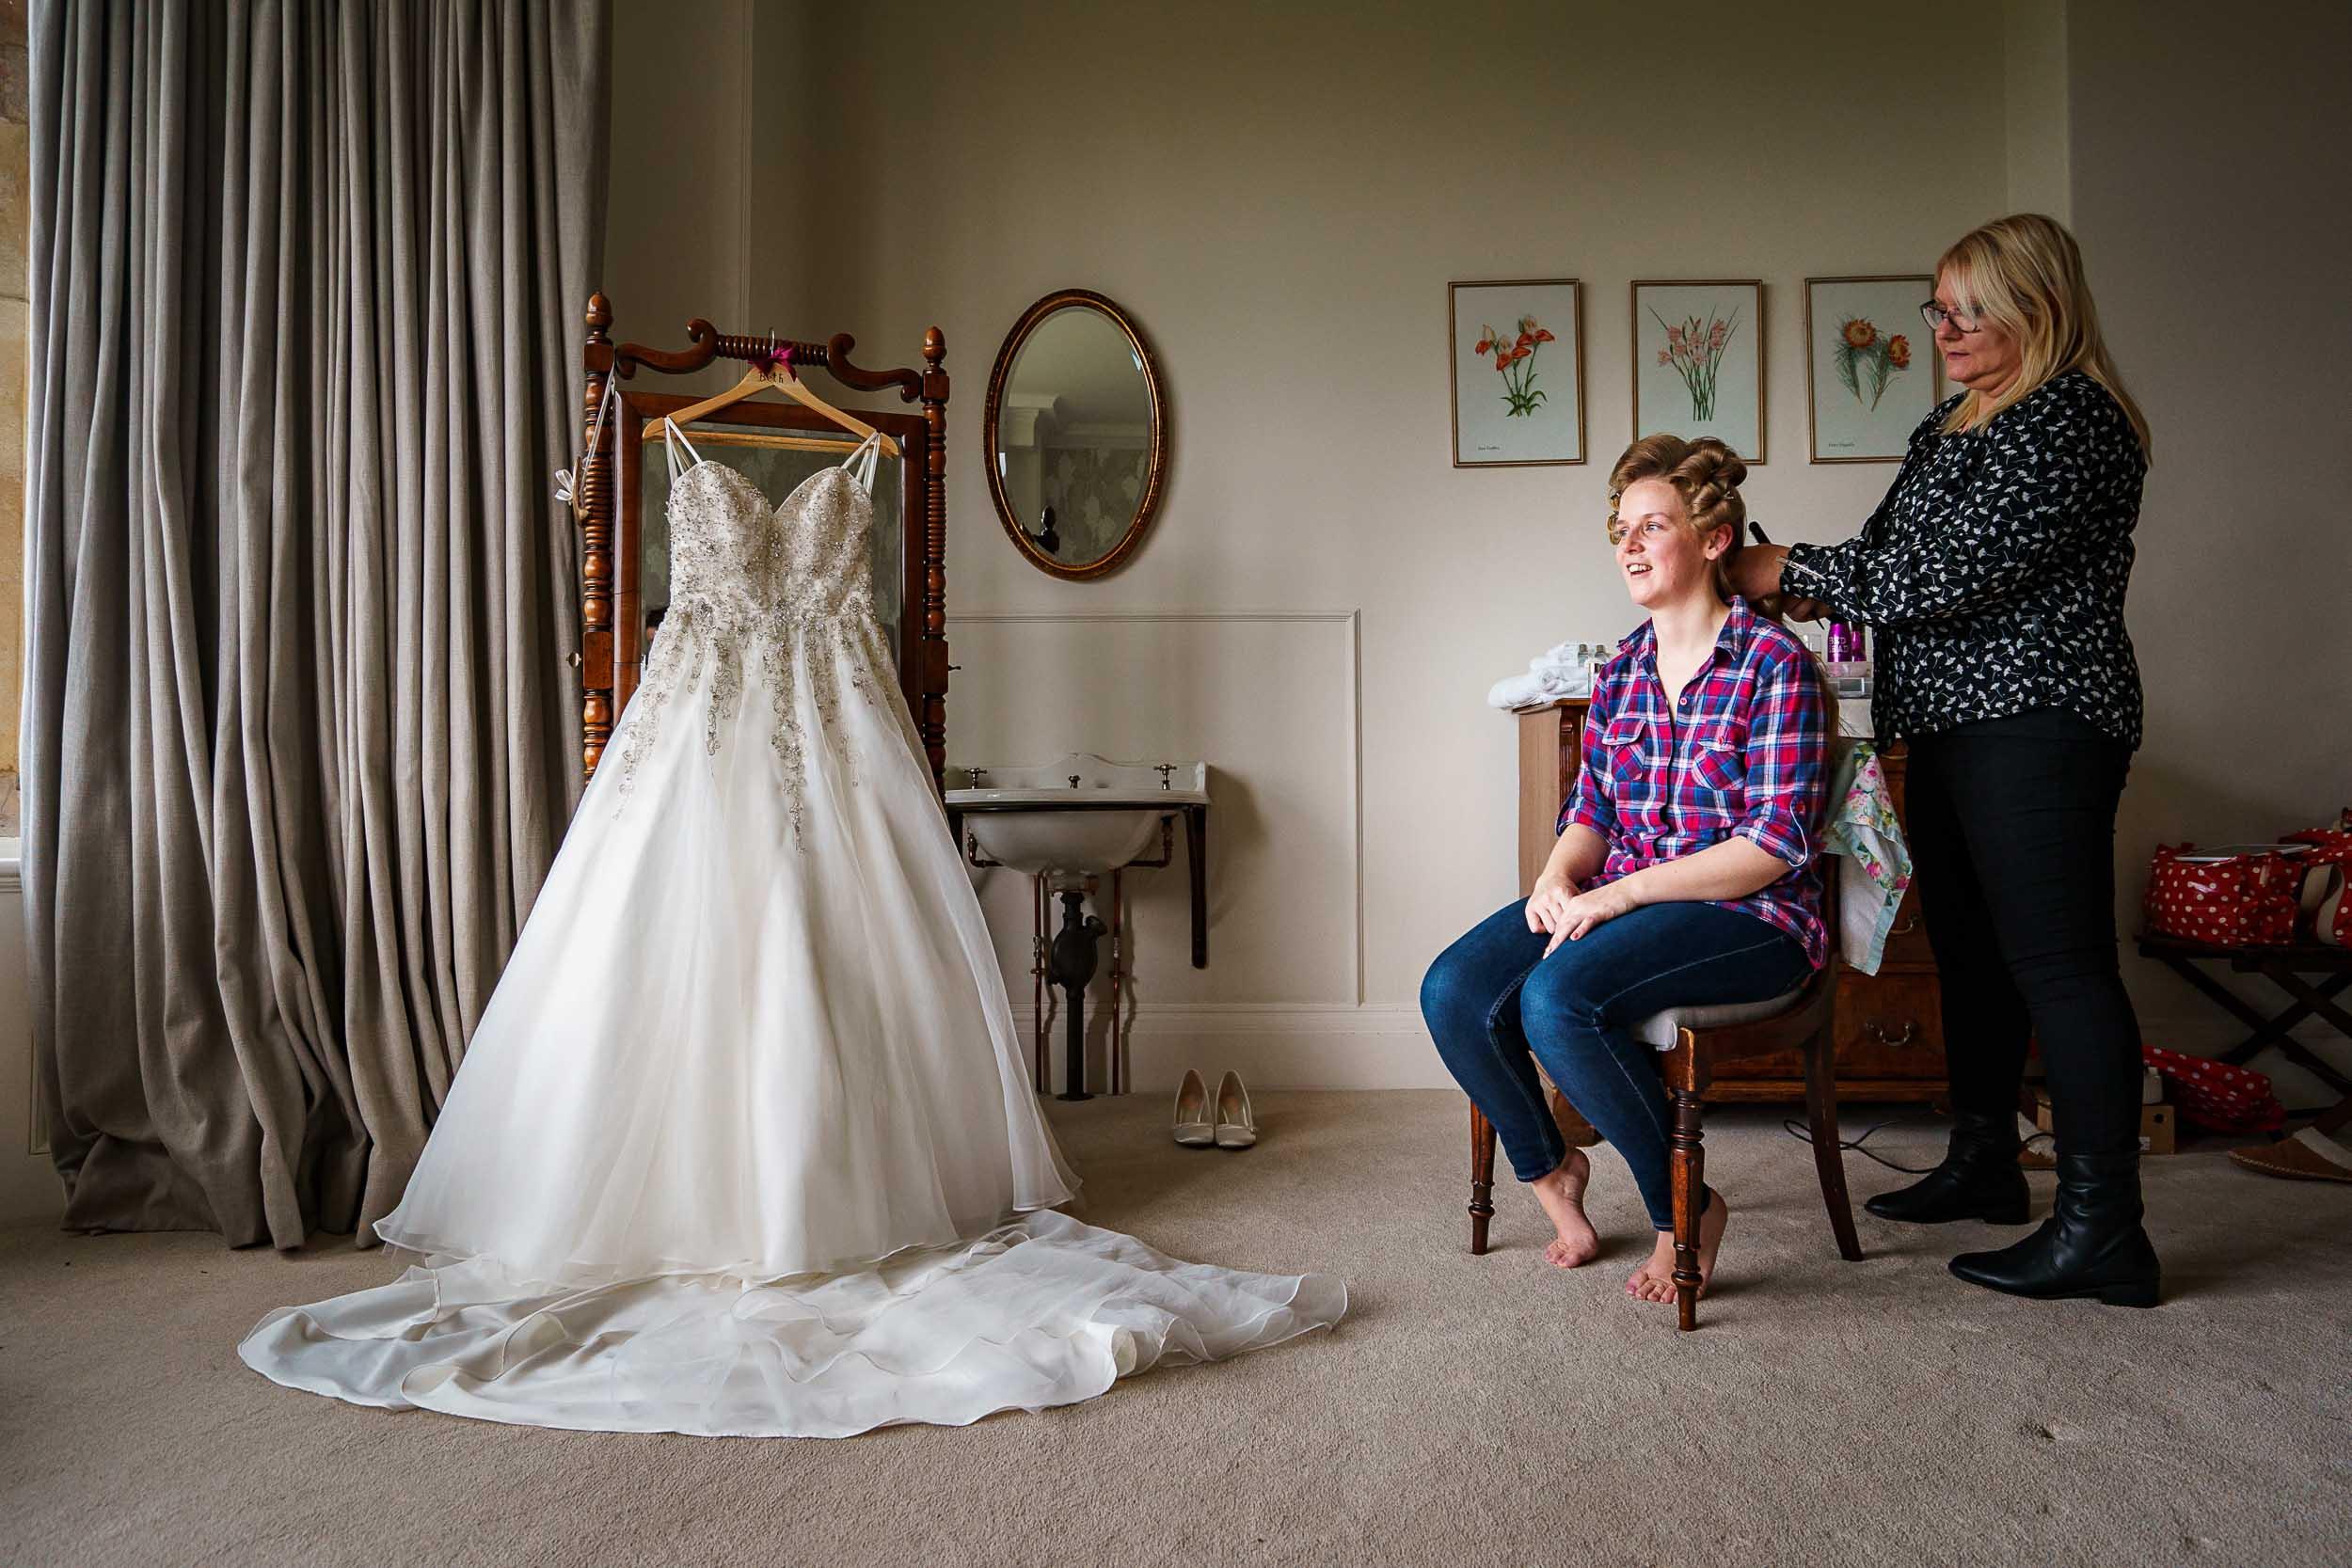 Whitney Court Estate, Whitney, Court, Estate, Wedding, Photographer, Weddings, Herefordshire, West-Midlands,Whitney court wedding photographer, David Liebst